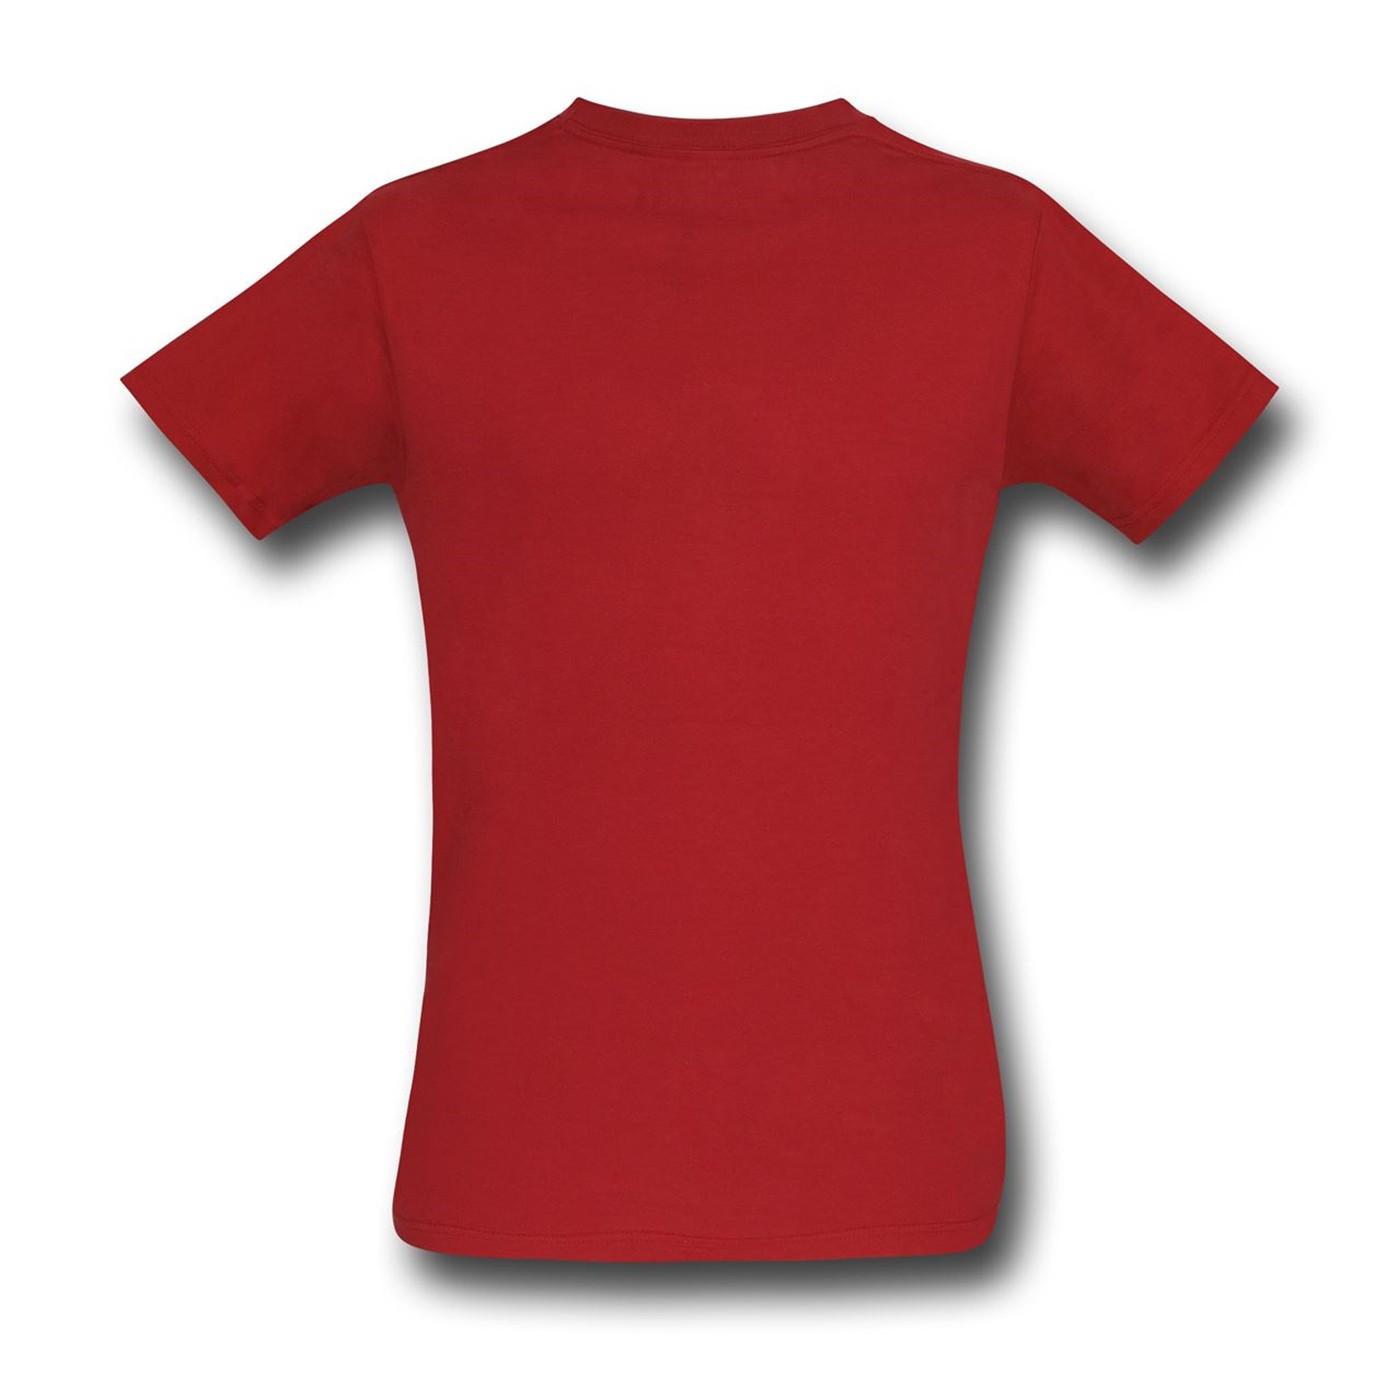 Captain America Civil War Iron Man Costume T-Shirt